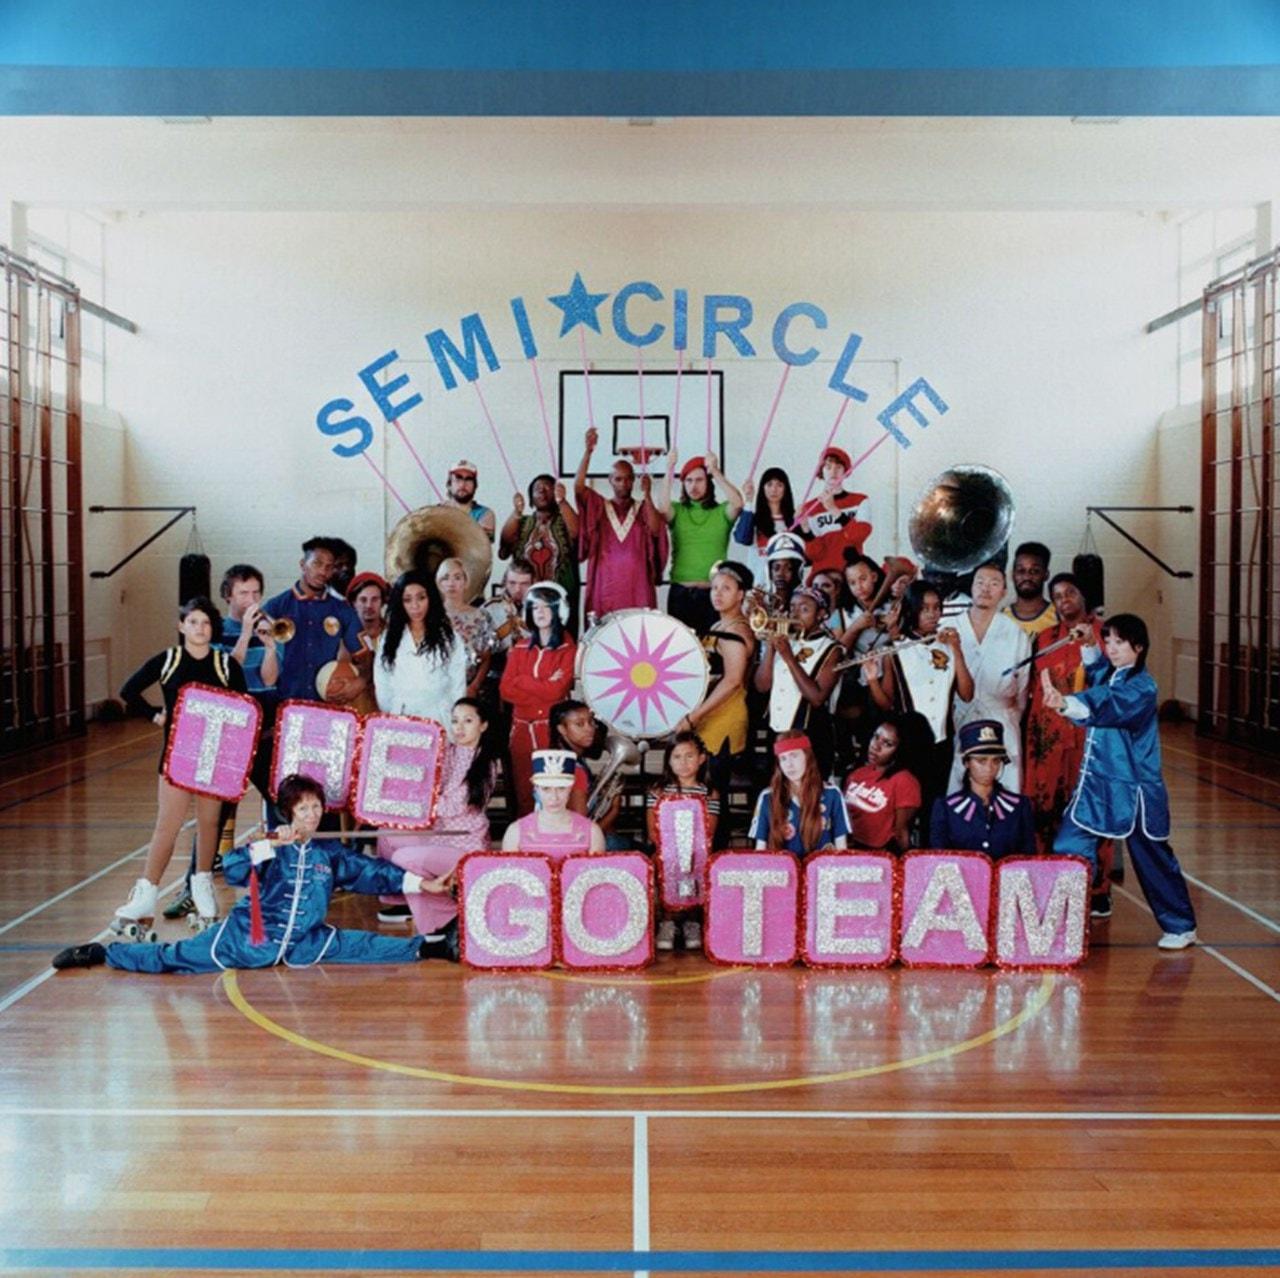 Semicircle - 1